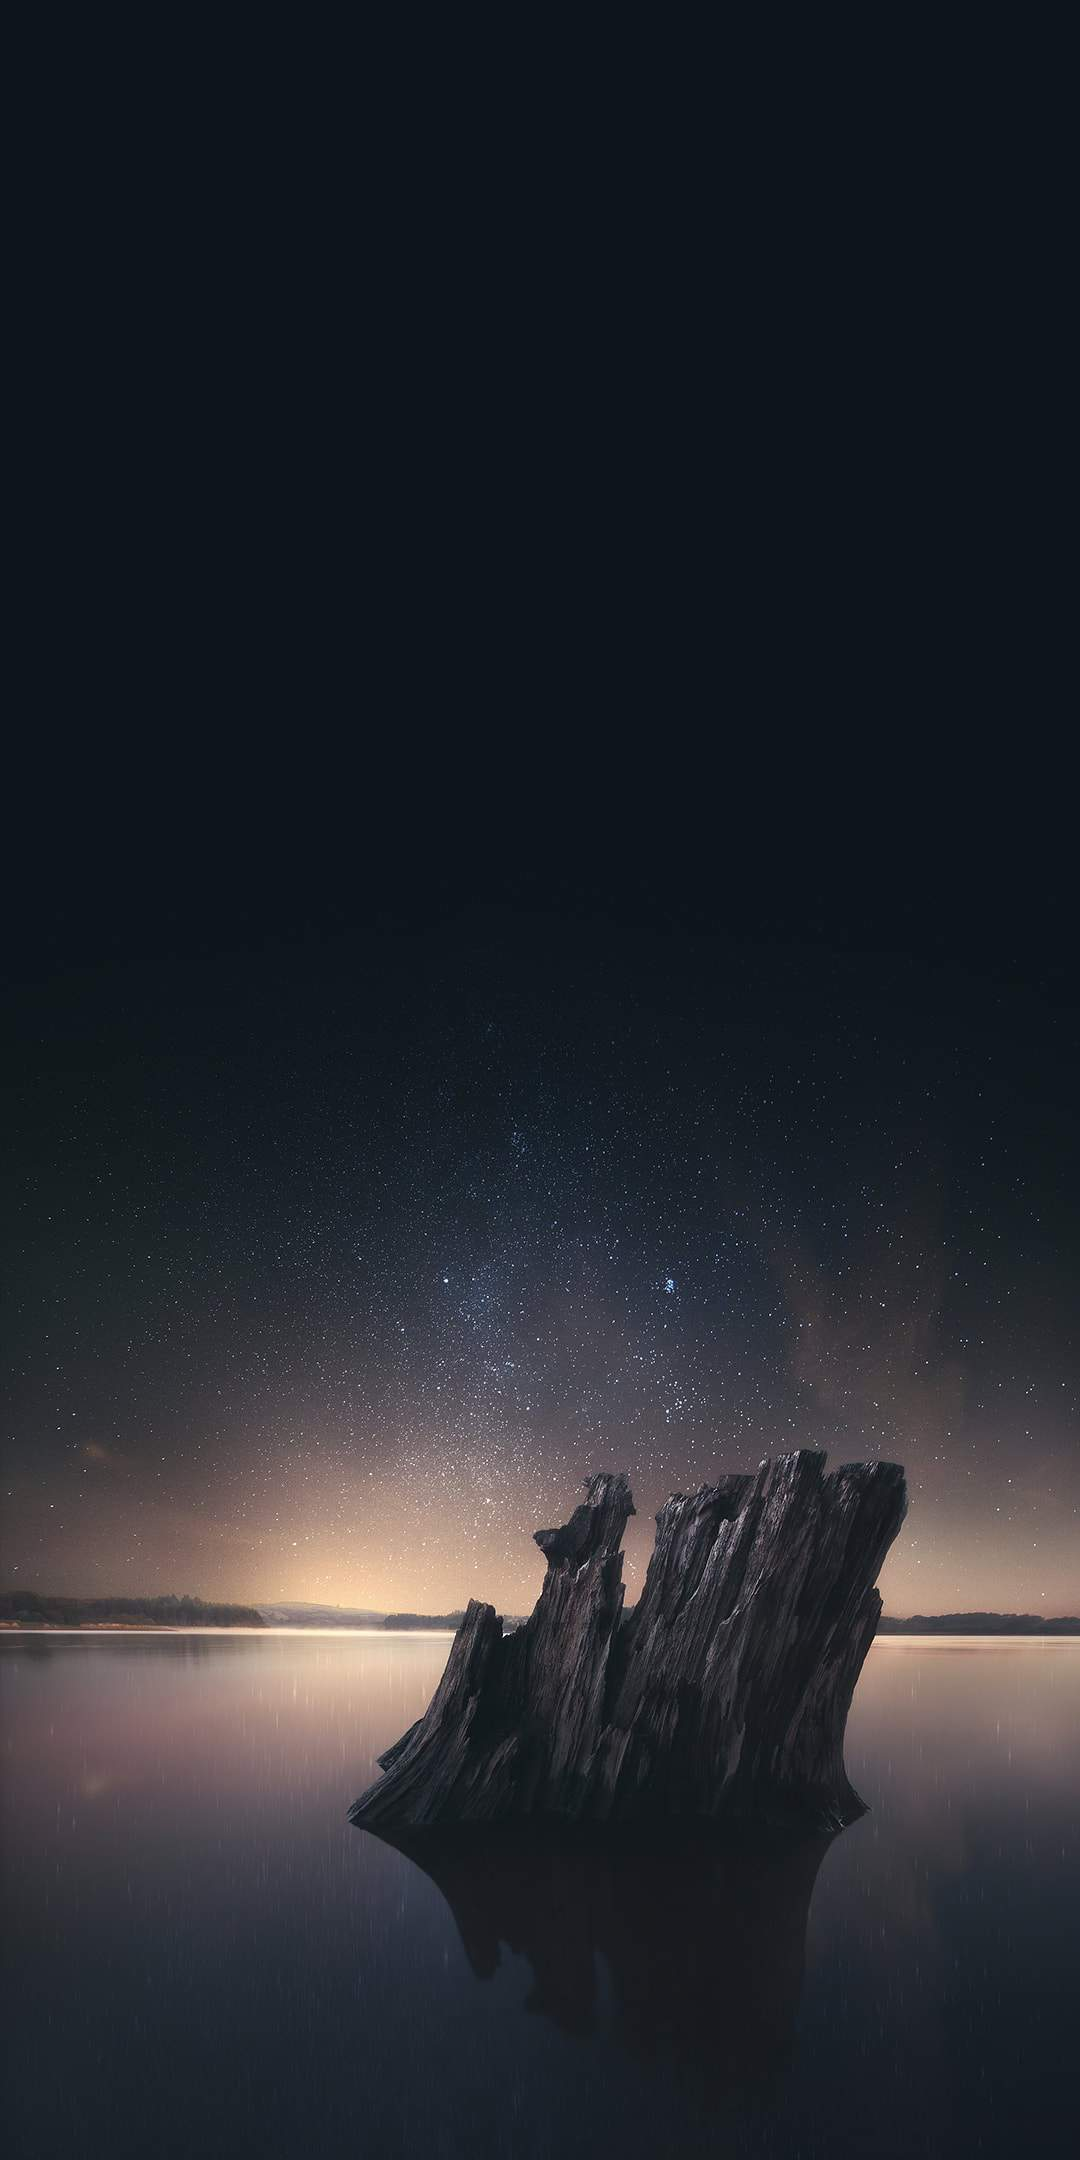 Night Starry Sky Ocean Rocks iPhone Wallpaper